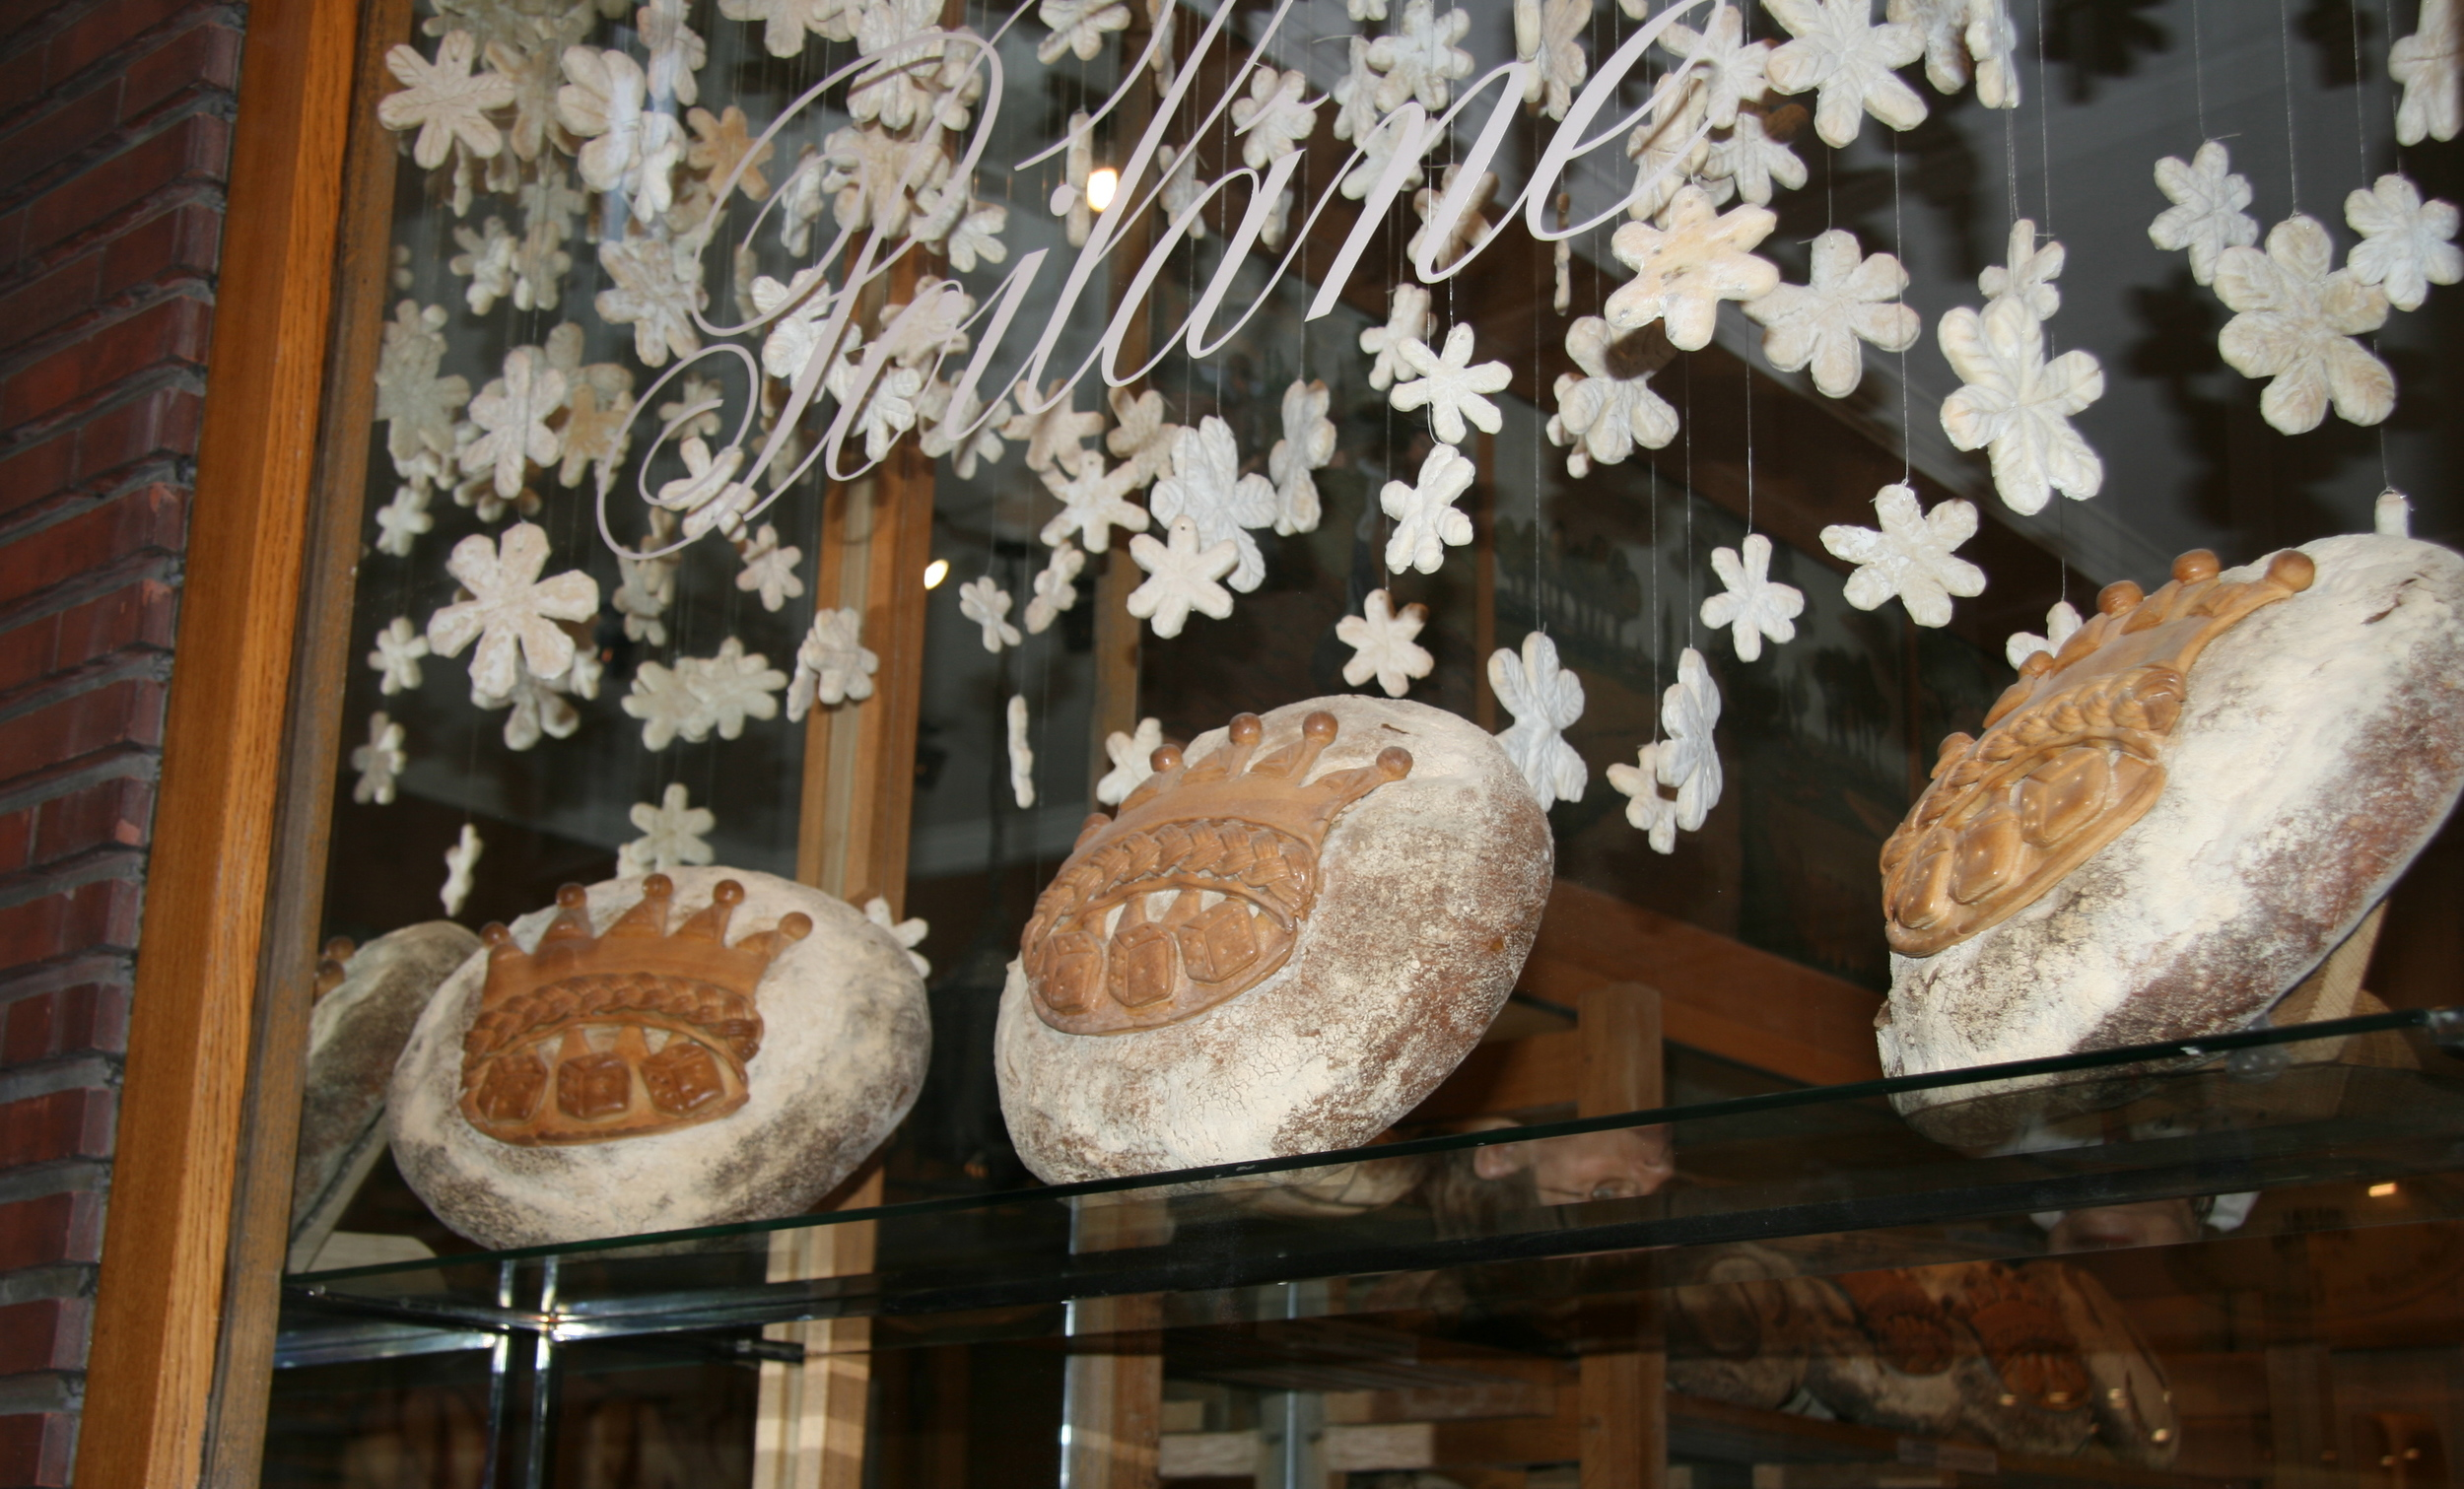 Winter in Paris….my favorite bread bakery